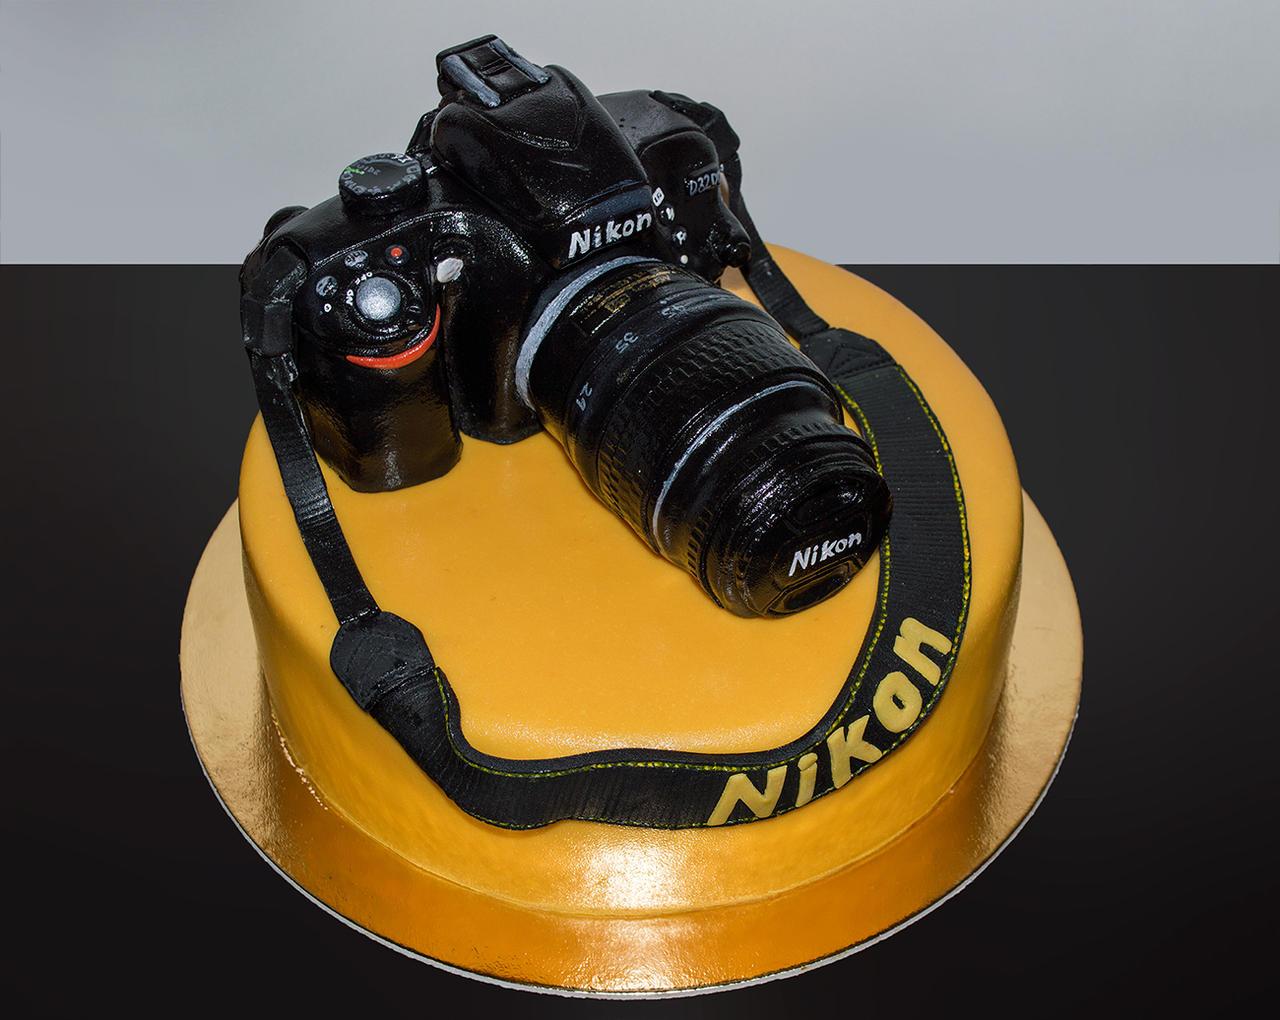 Nikon Camera Cake Images : Sacher Nikon CAKE by Mandy0x on DeviantArt